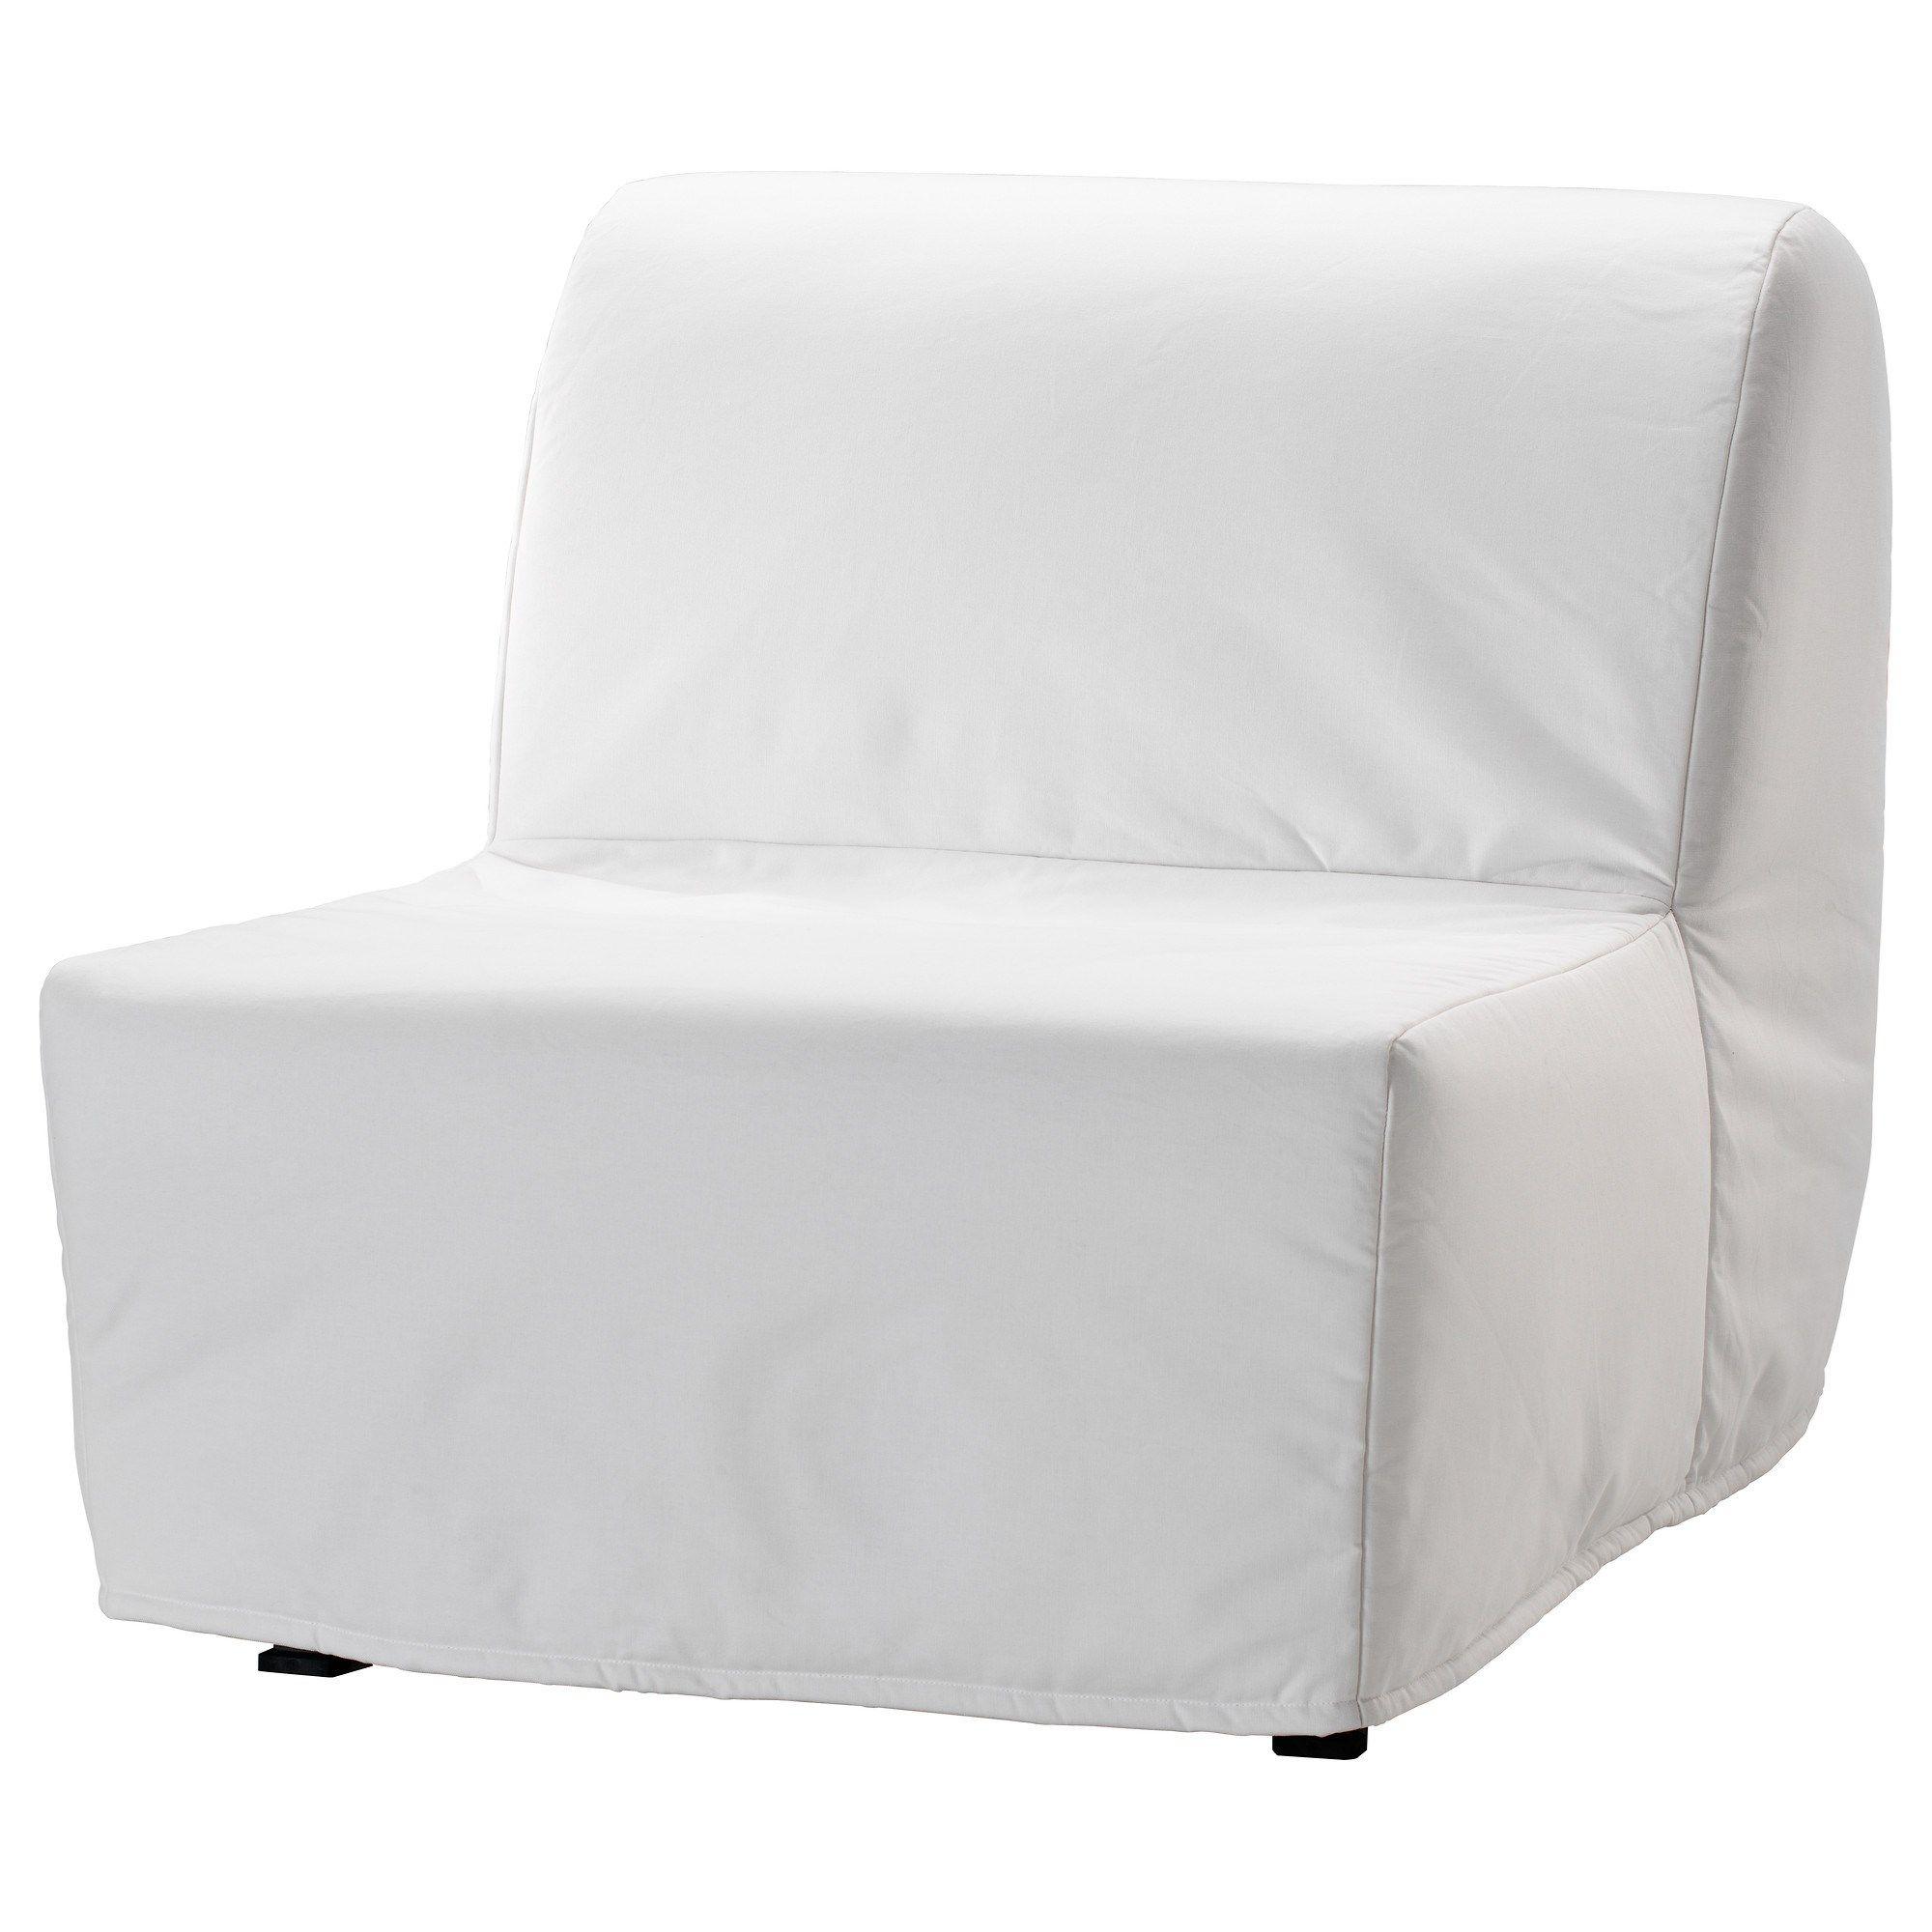 Lycksele Lovas Tekli Yatakli Koltuk Ransta Beyaz Ikea Fikirleri Oturma Odalari Yatak Kanepe